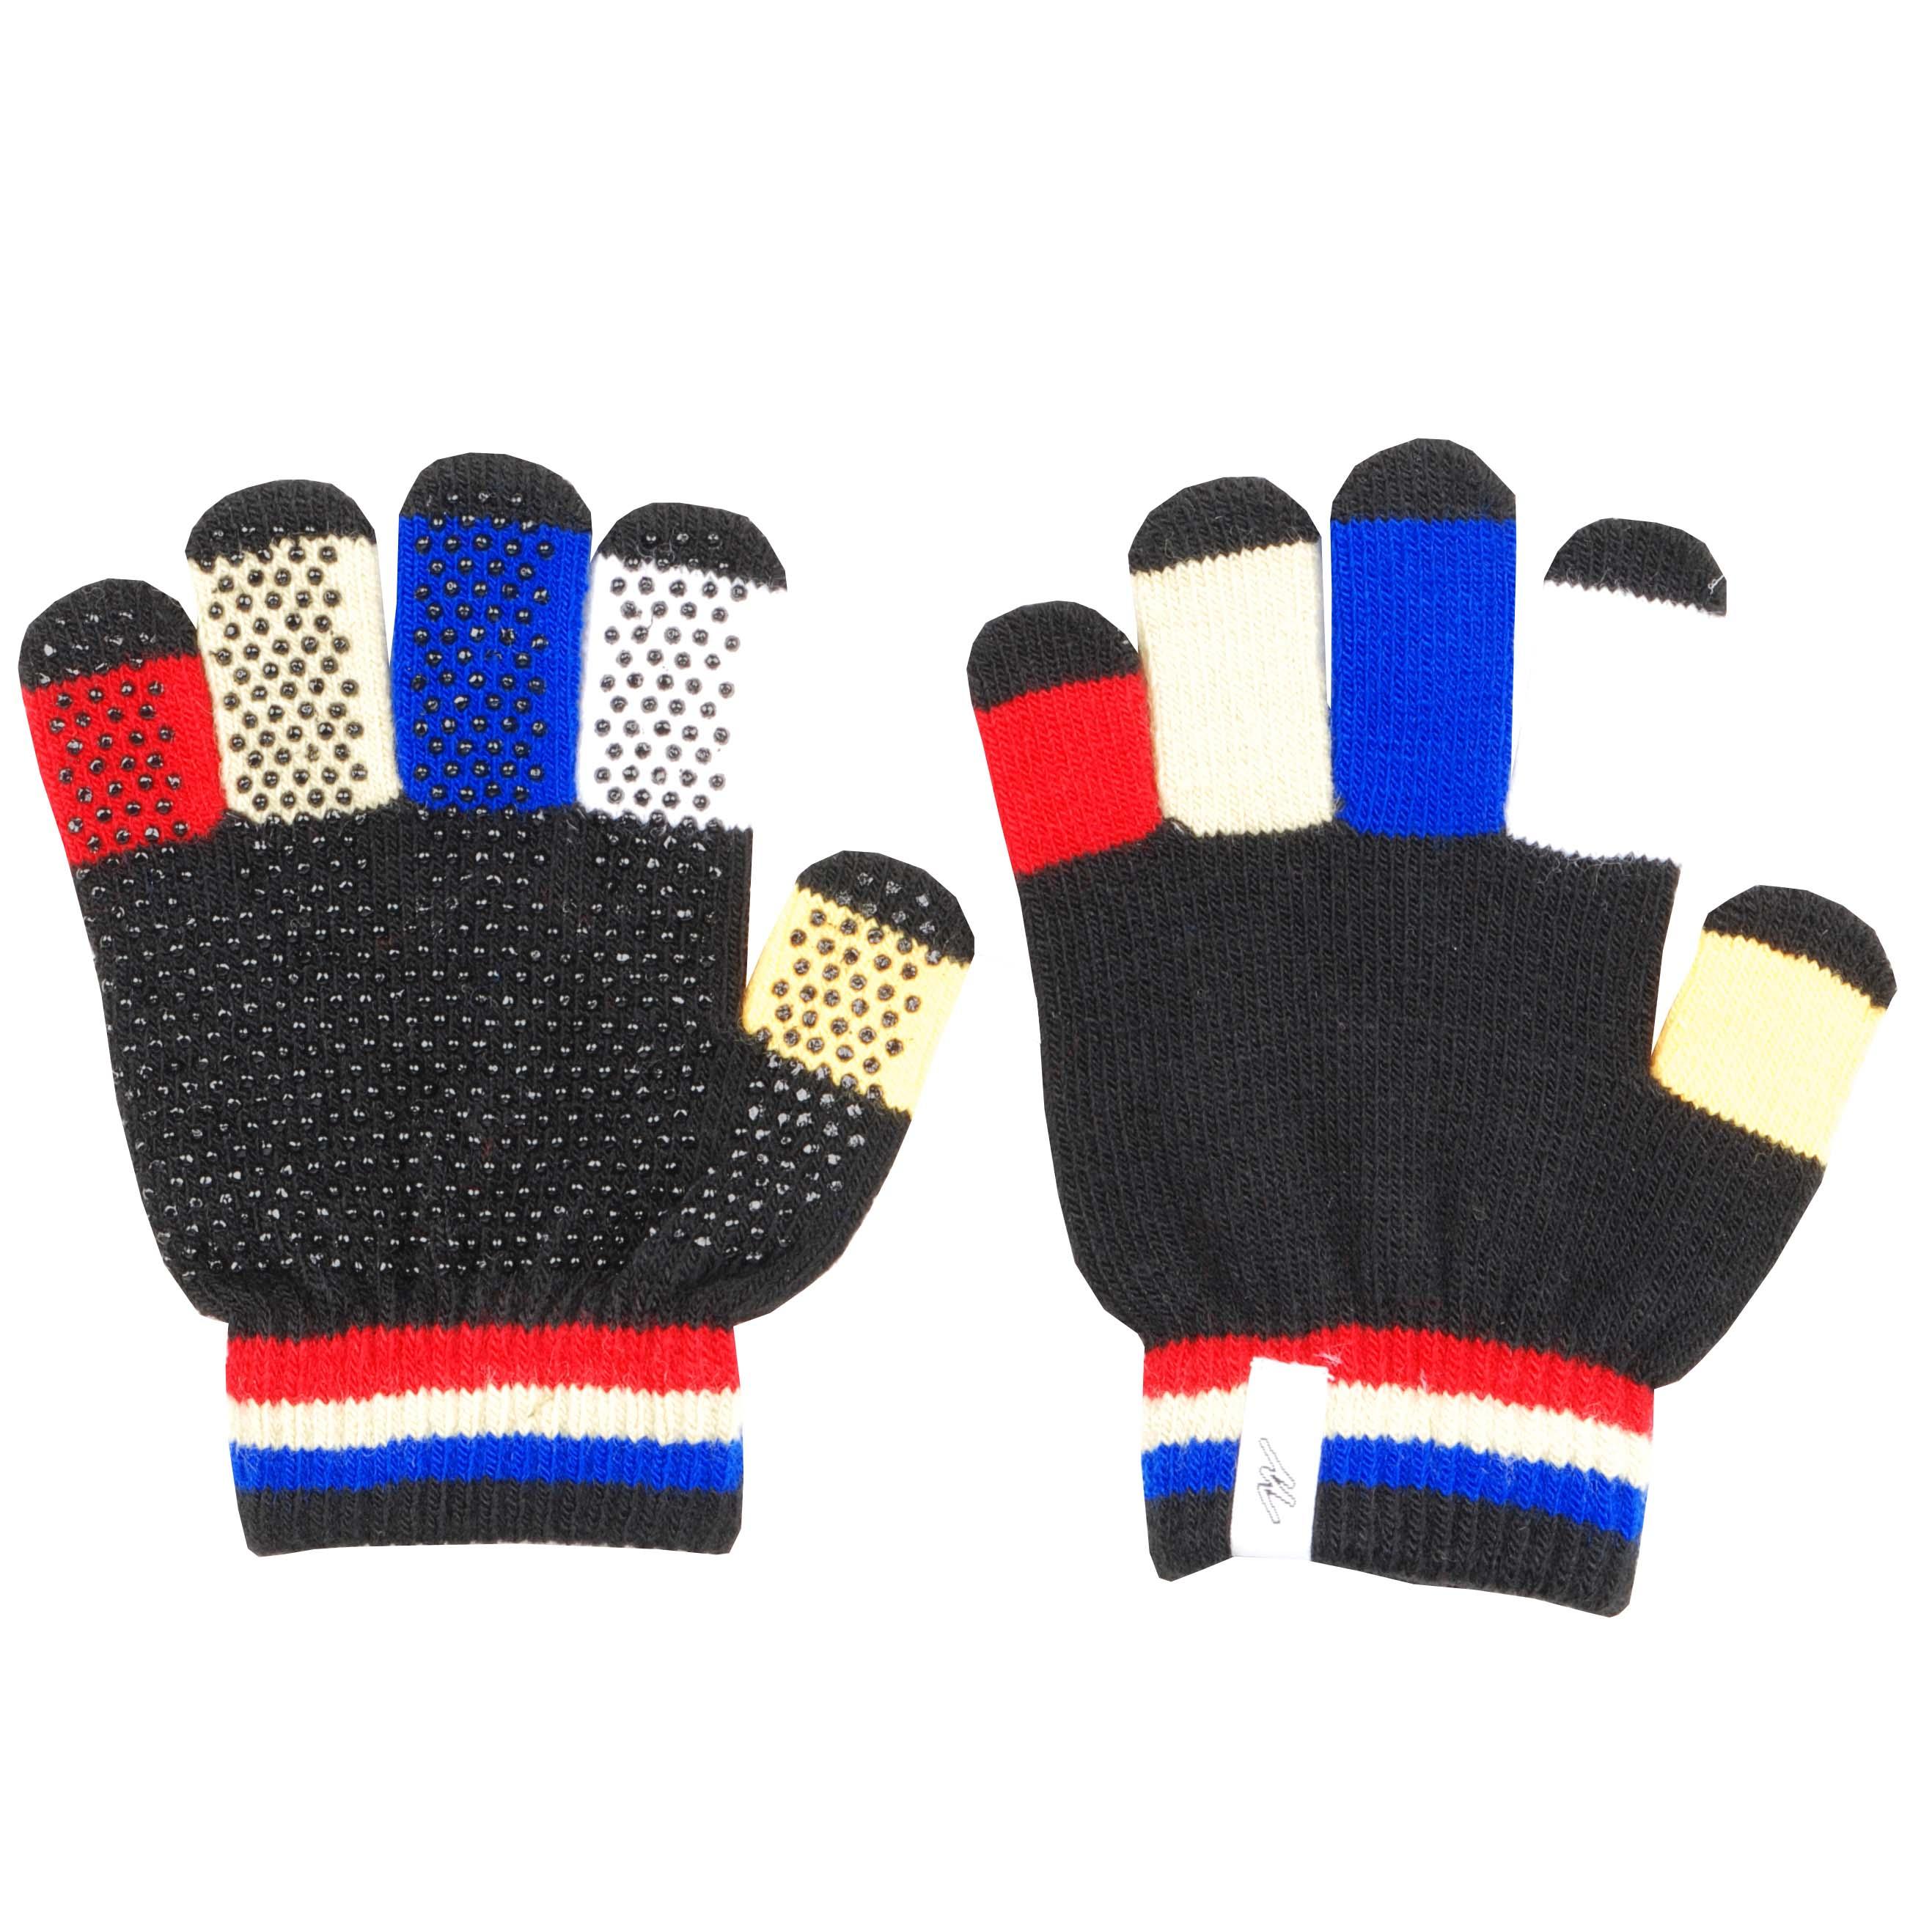 Mondoni Magic Gloves kinder handschoenen multi